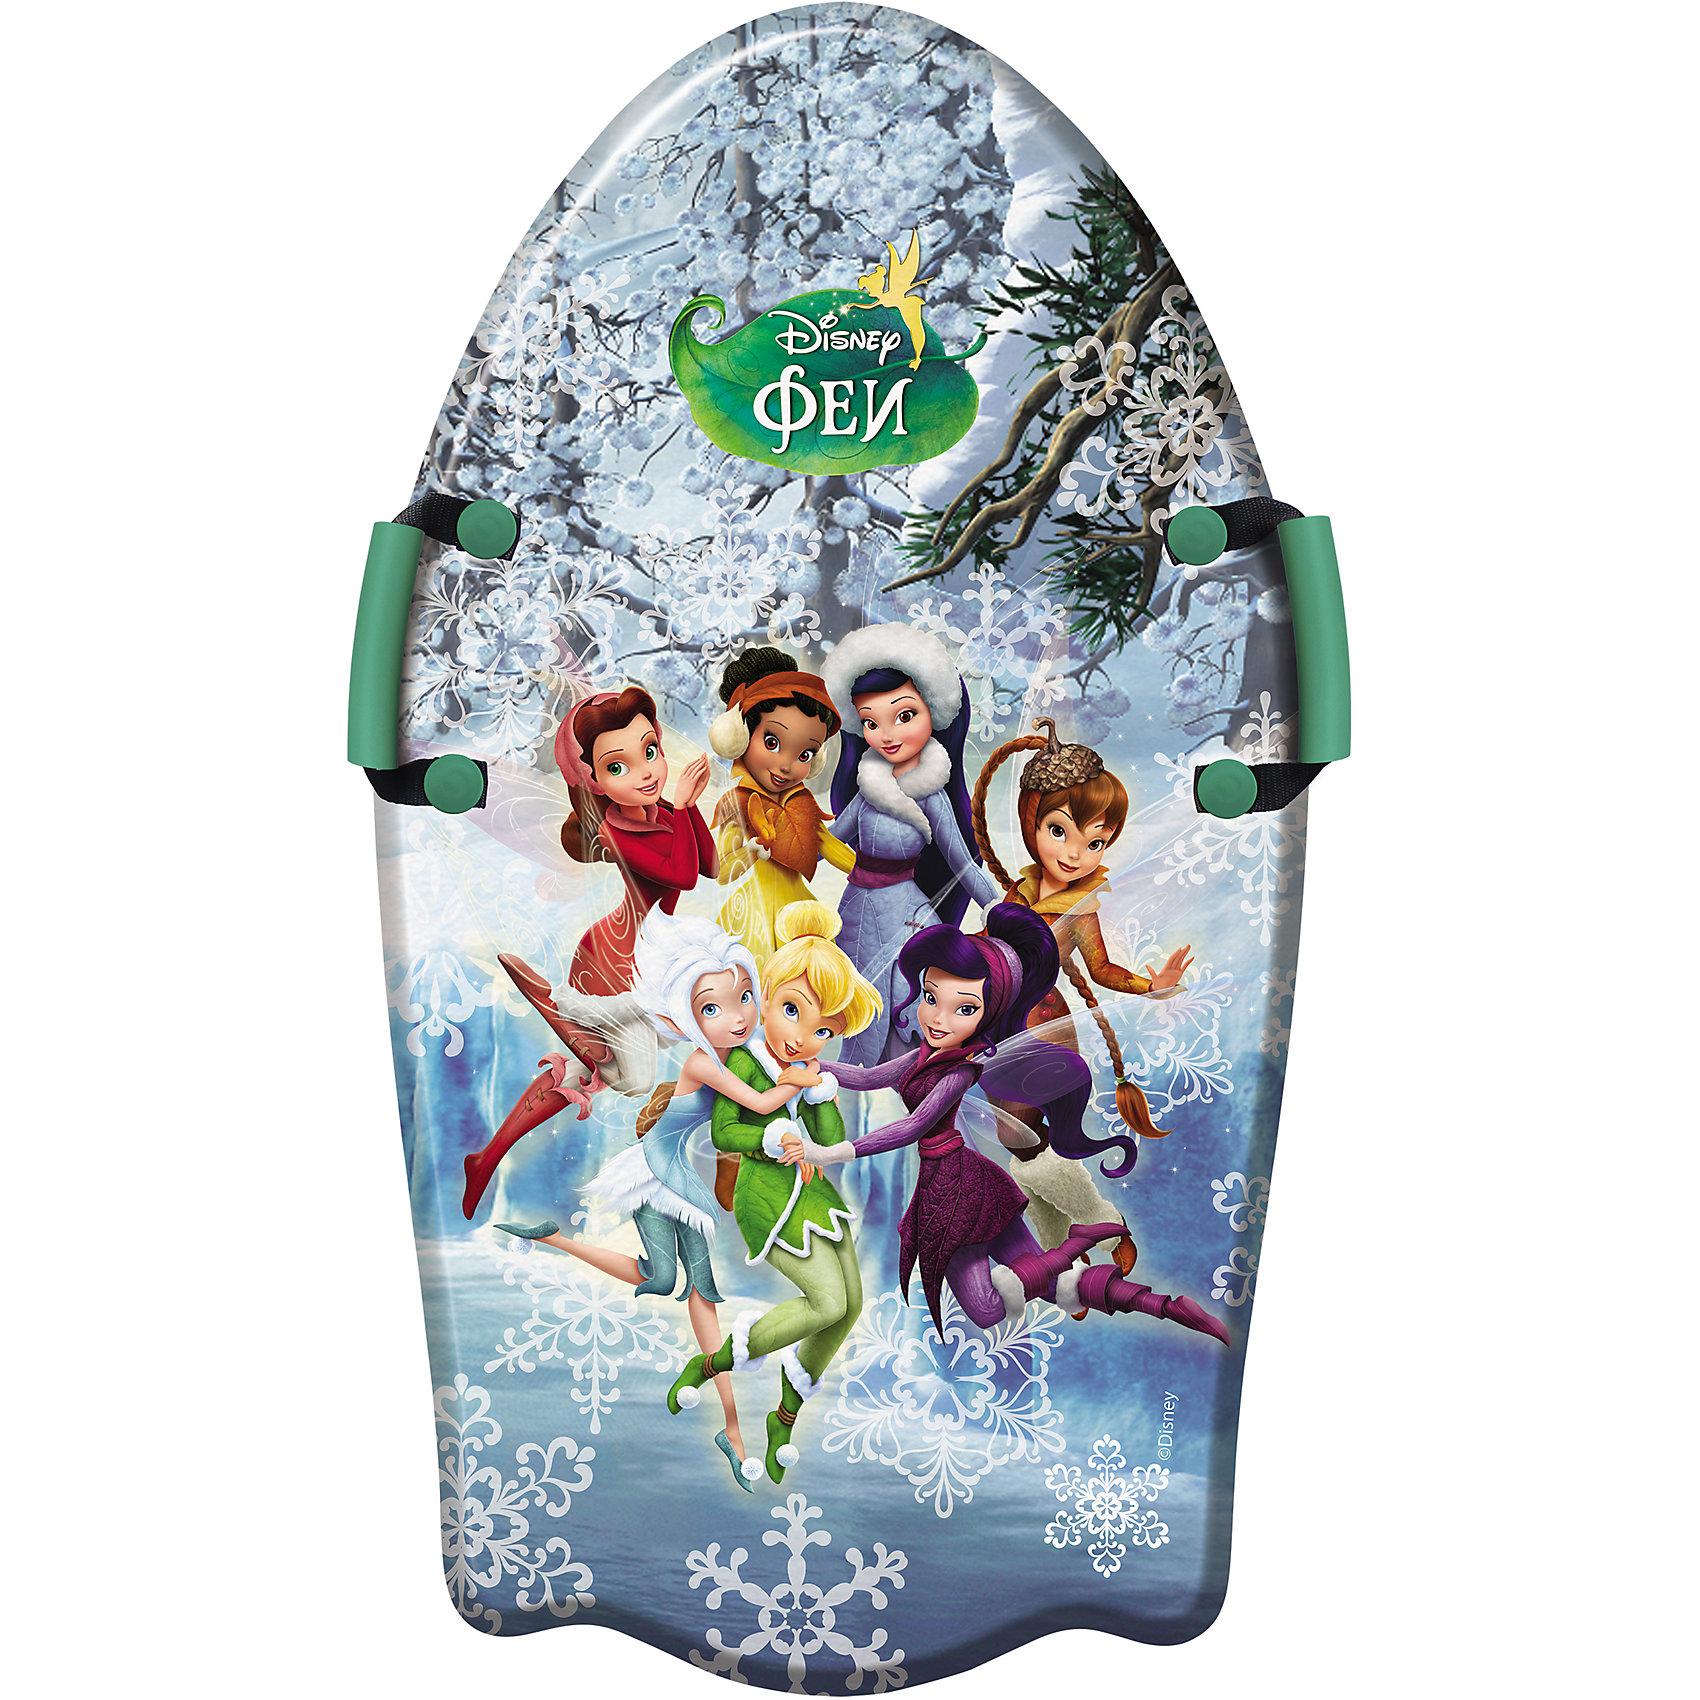 Disney Ледянка Феи, 92см, с плотными ручками, Disney ледянка disney disney феи 92см т59116